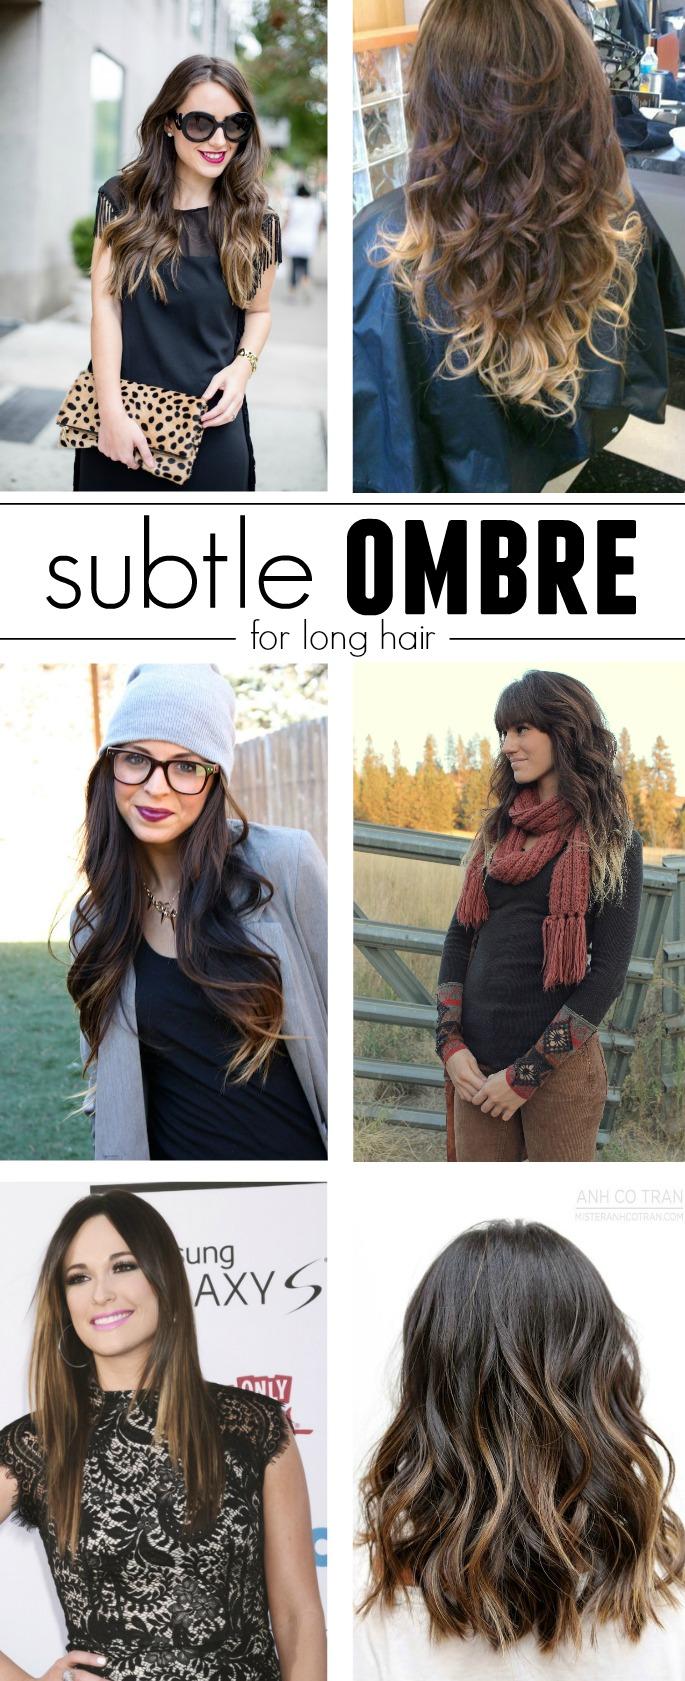 Subtle Ombre for Long Hair